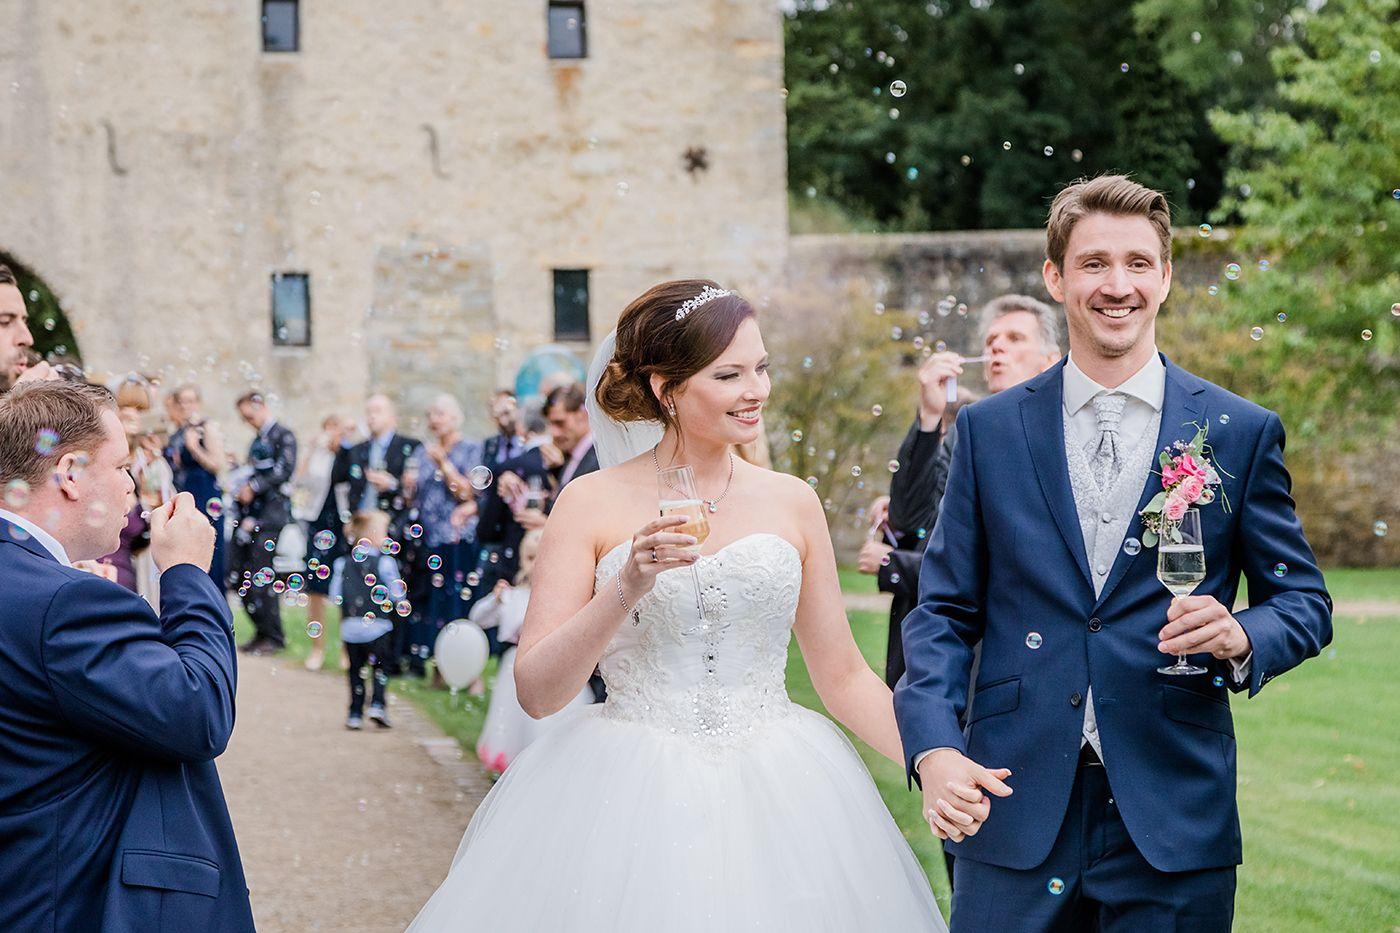 hochzeit_48__hochzeitsfotografin_lumoid_nadine_lotze_hagen_ruhrgebiet_detail_rittergut_stoermede_sektempfang_prosecco_wedding_bubbles